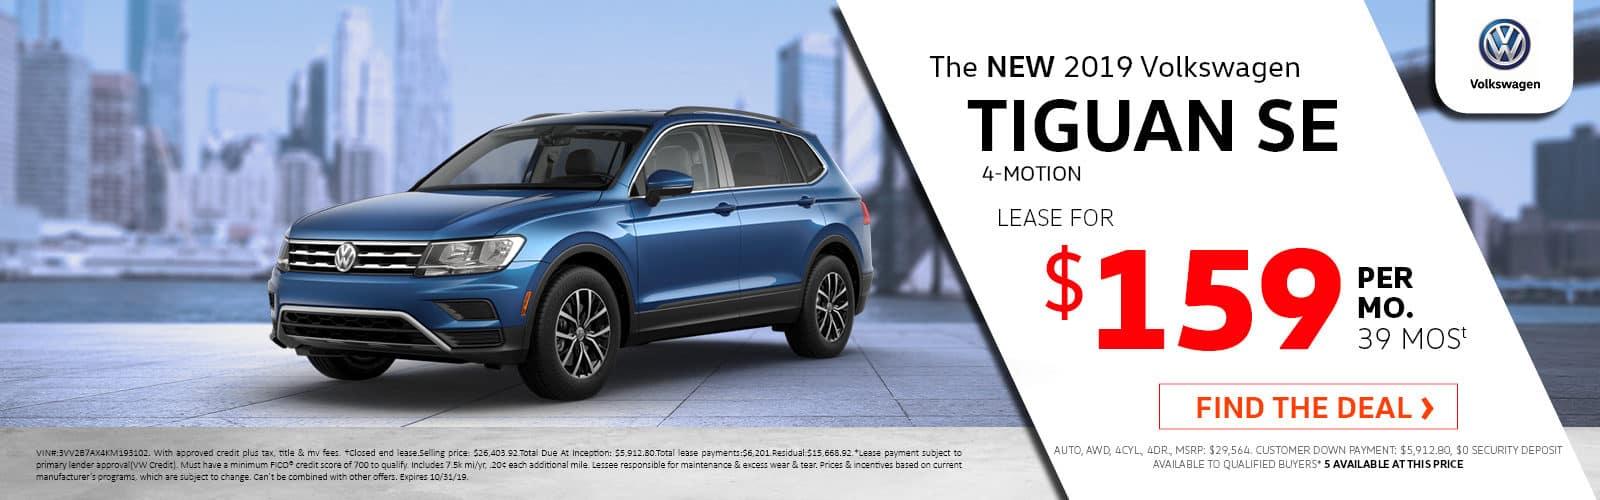 Vw Lease Deals >> Ny Volkswagen Dealership In Staten Island New York New